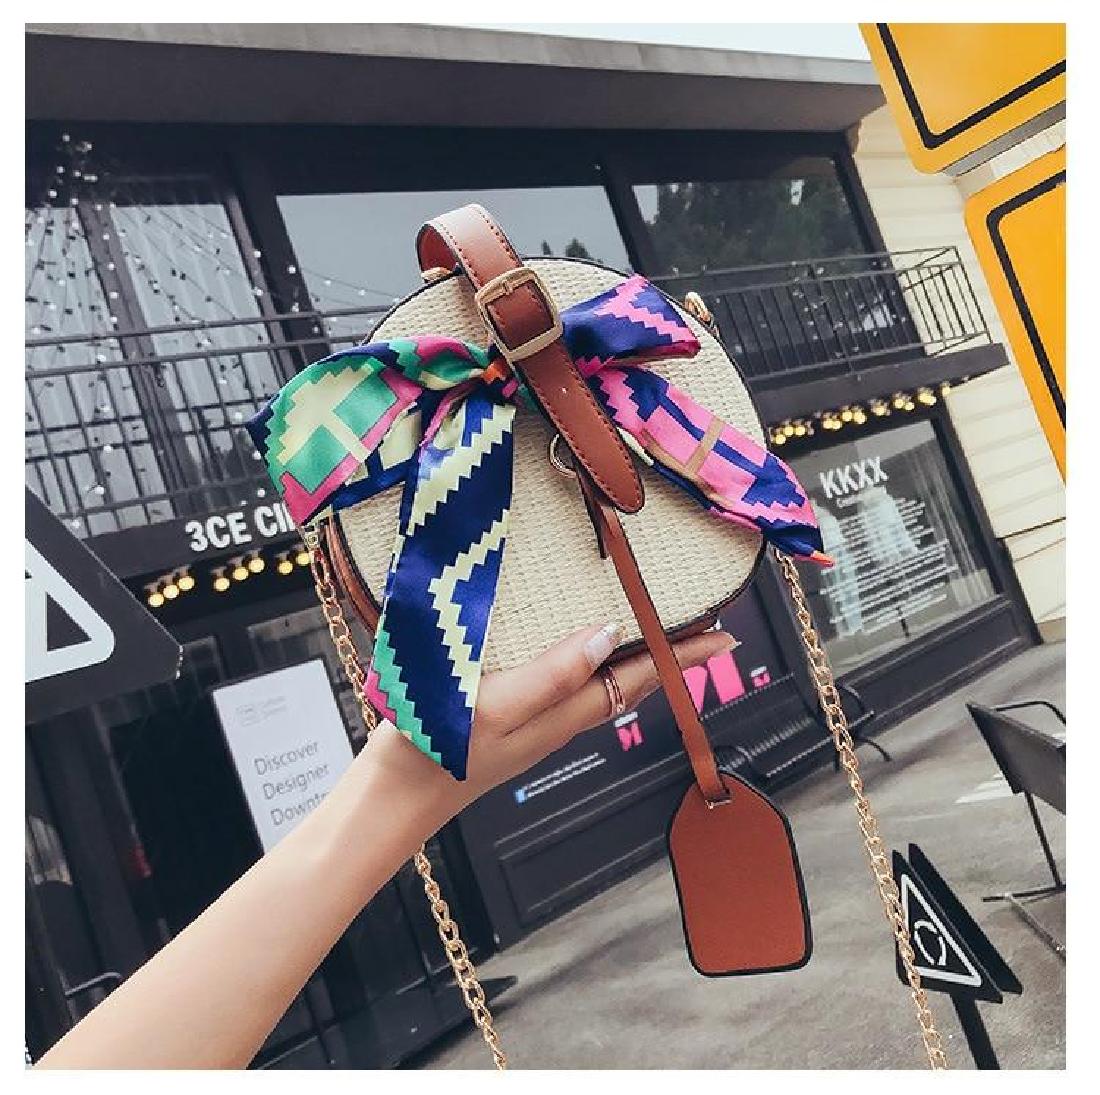 2969e0fd3c89 ... Bag STRAW shoulder tote bag Rattan Woven Beach Handmade high quality  100% pure durable natural